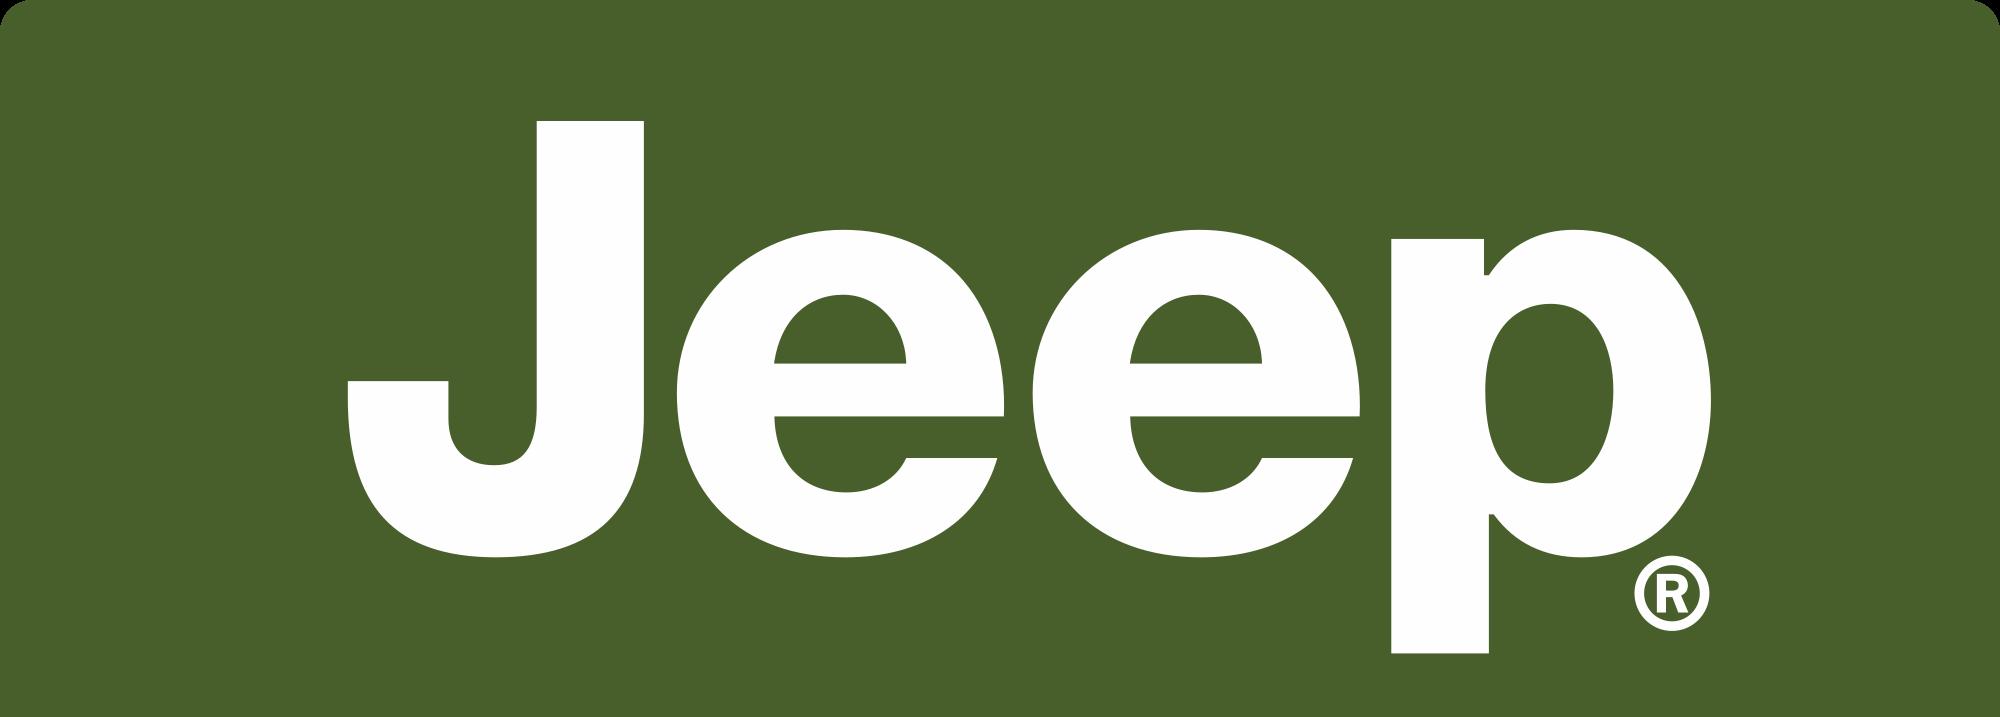 télécharger logo jeep